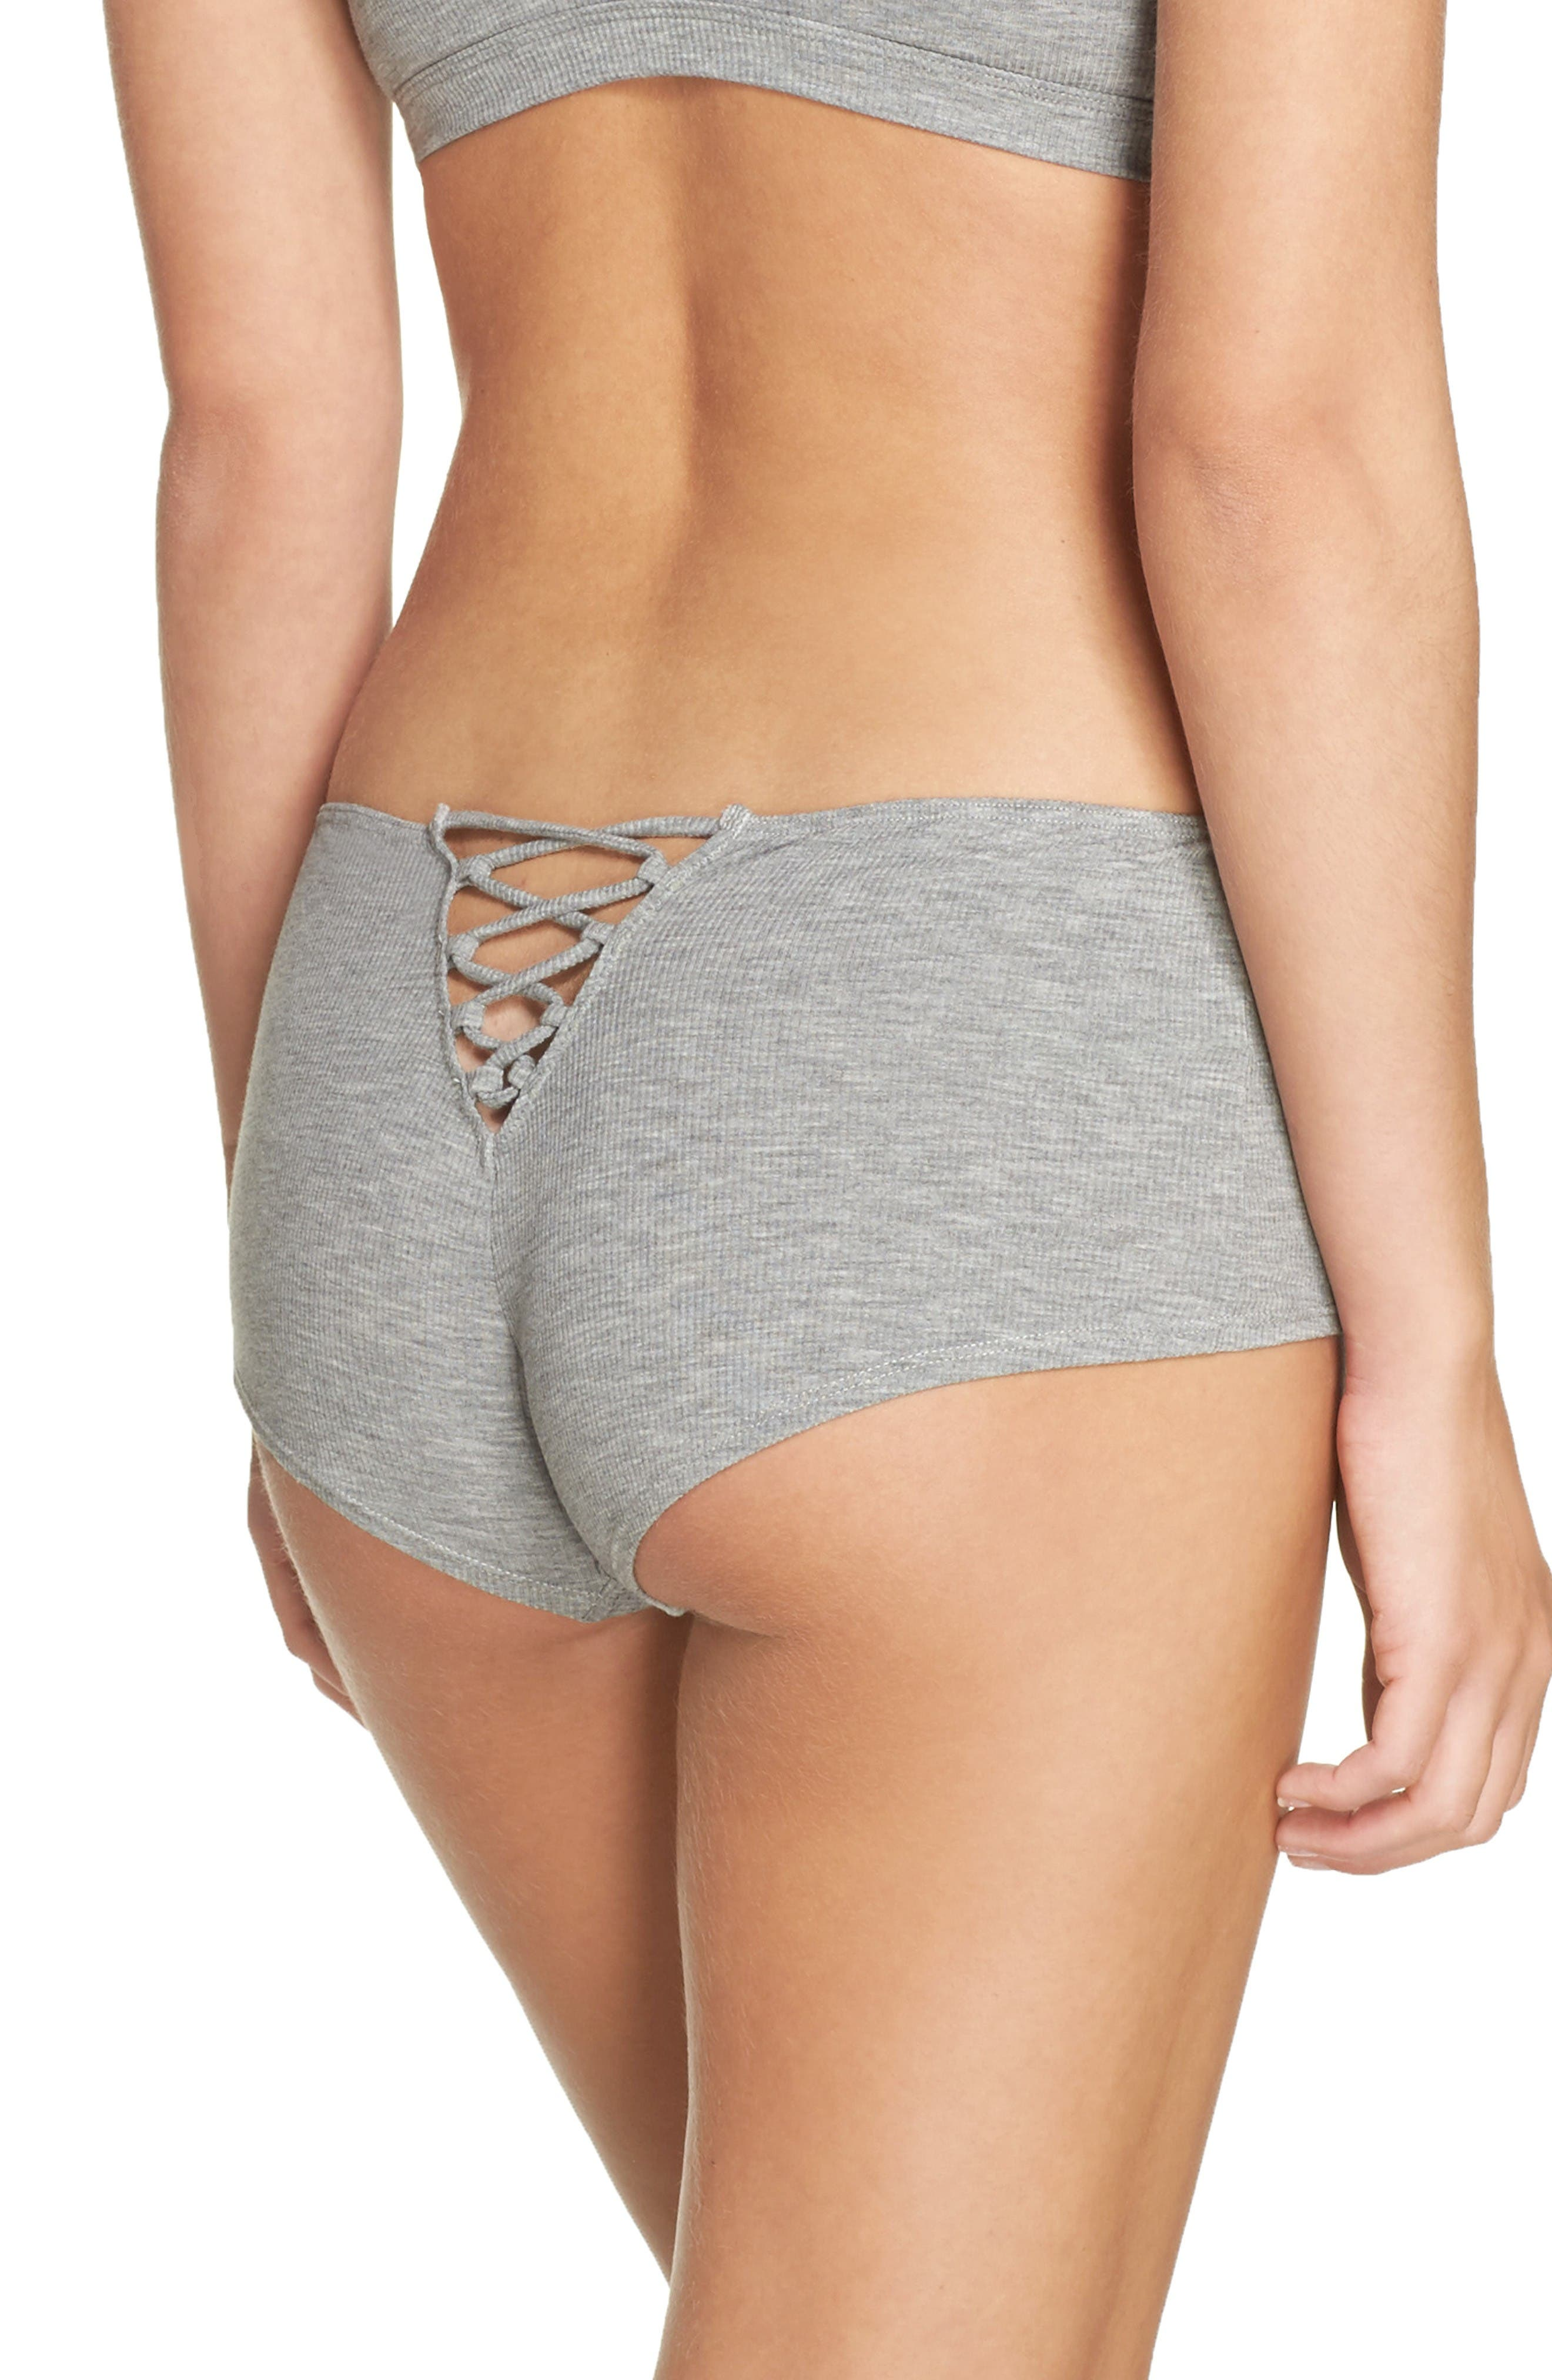 Honeydew Intimates Tie Back Hipster Panties